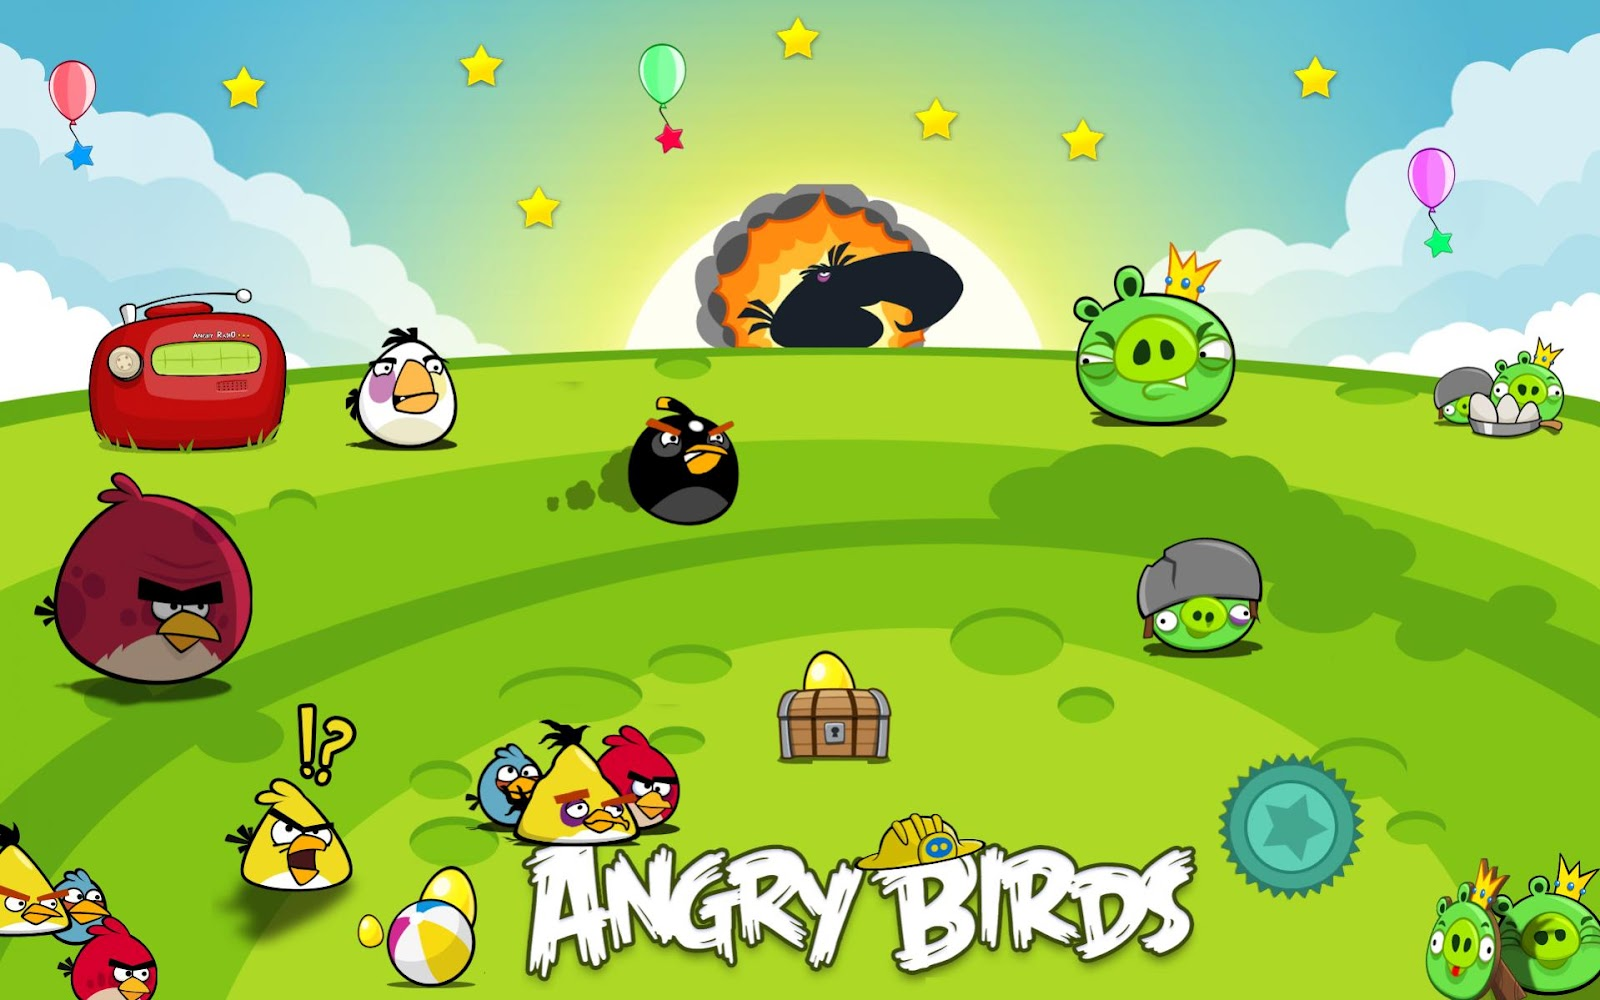 http://2.bp.blogspot.com/-r5bH7KeinIo/UCFQq_5ROaI/AAAAAAAAAbo/mcmfCM3WdWM/s1600/angry_birds_wallpaper_by_vistafreddy-d39wj2z.jpg